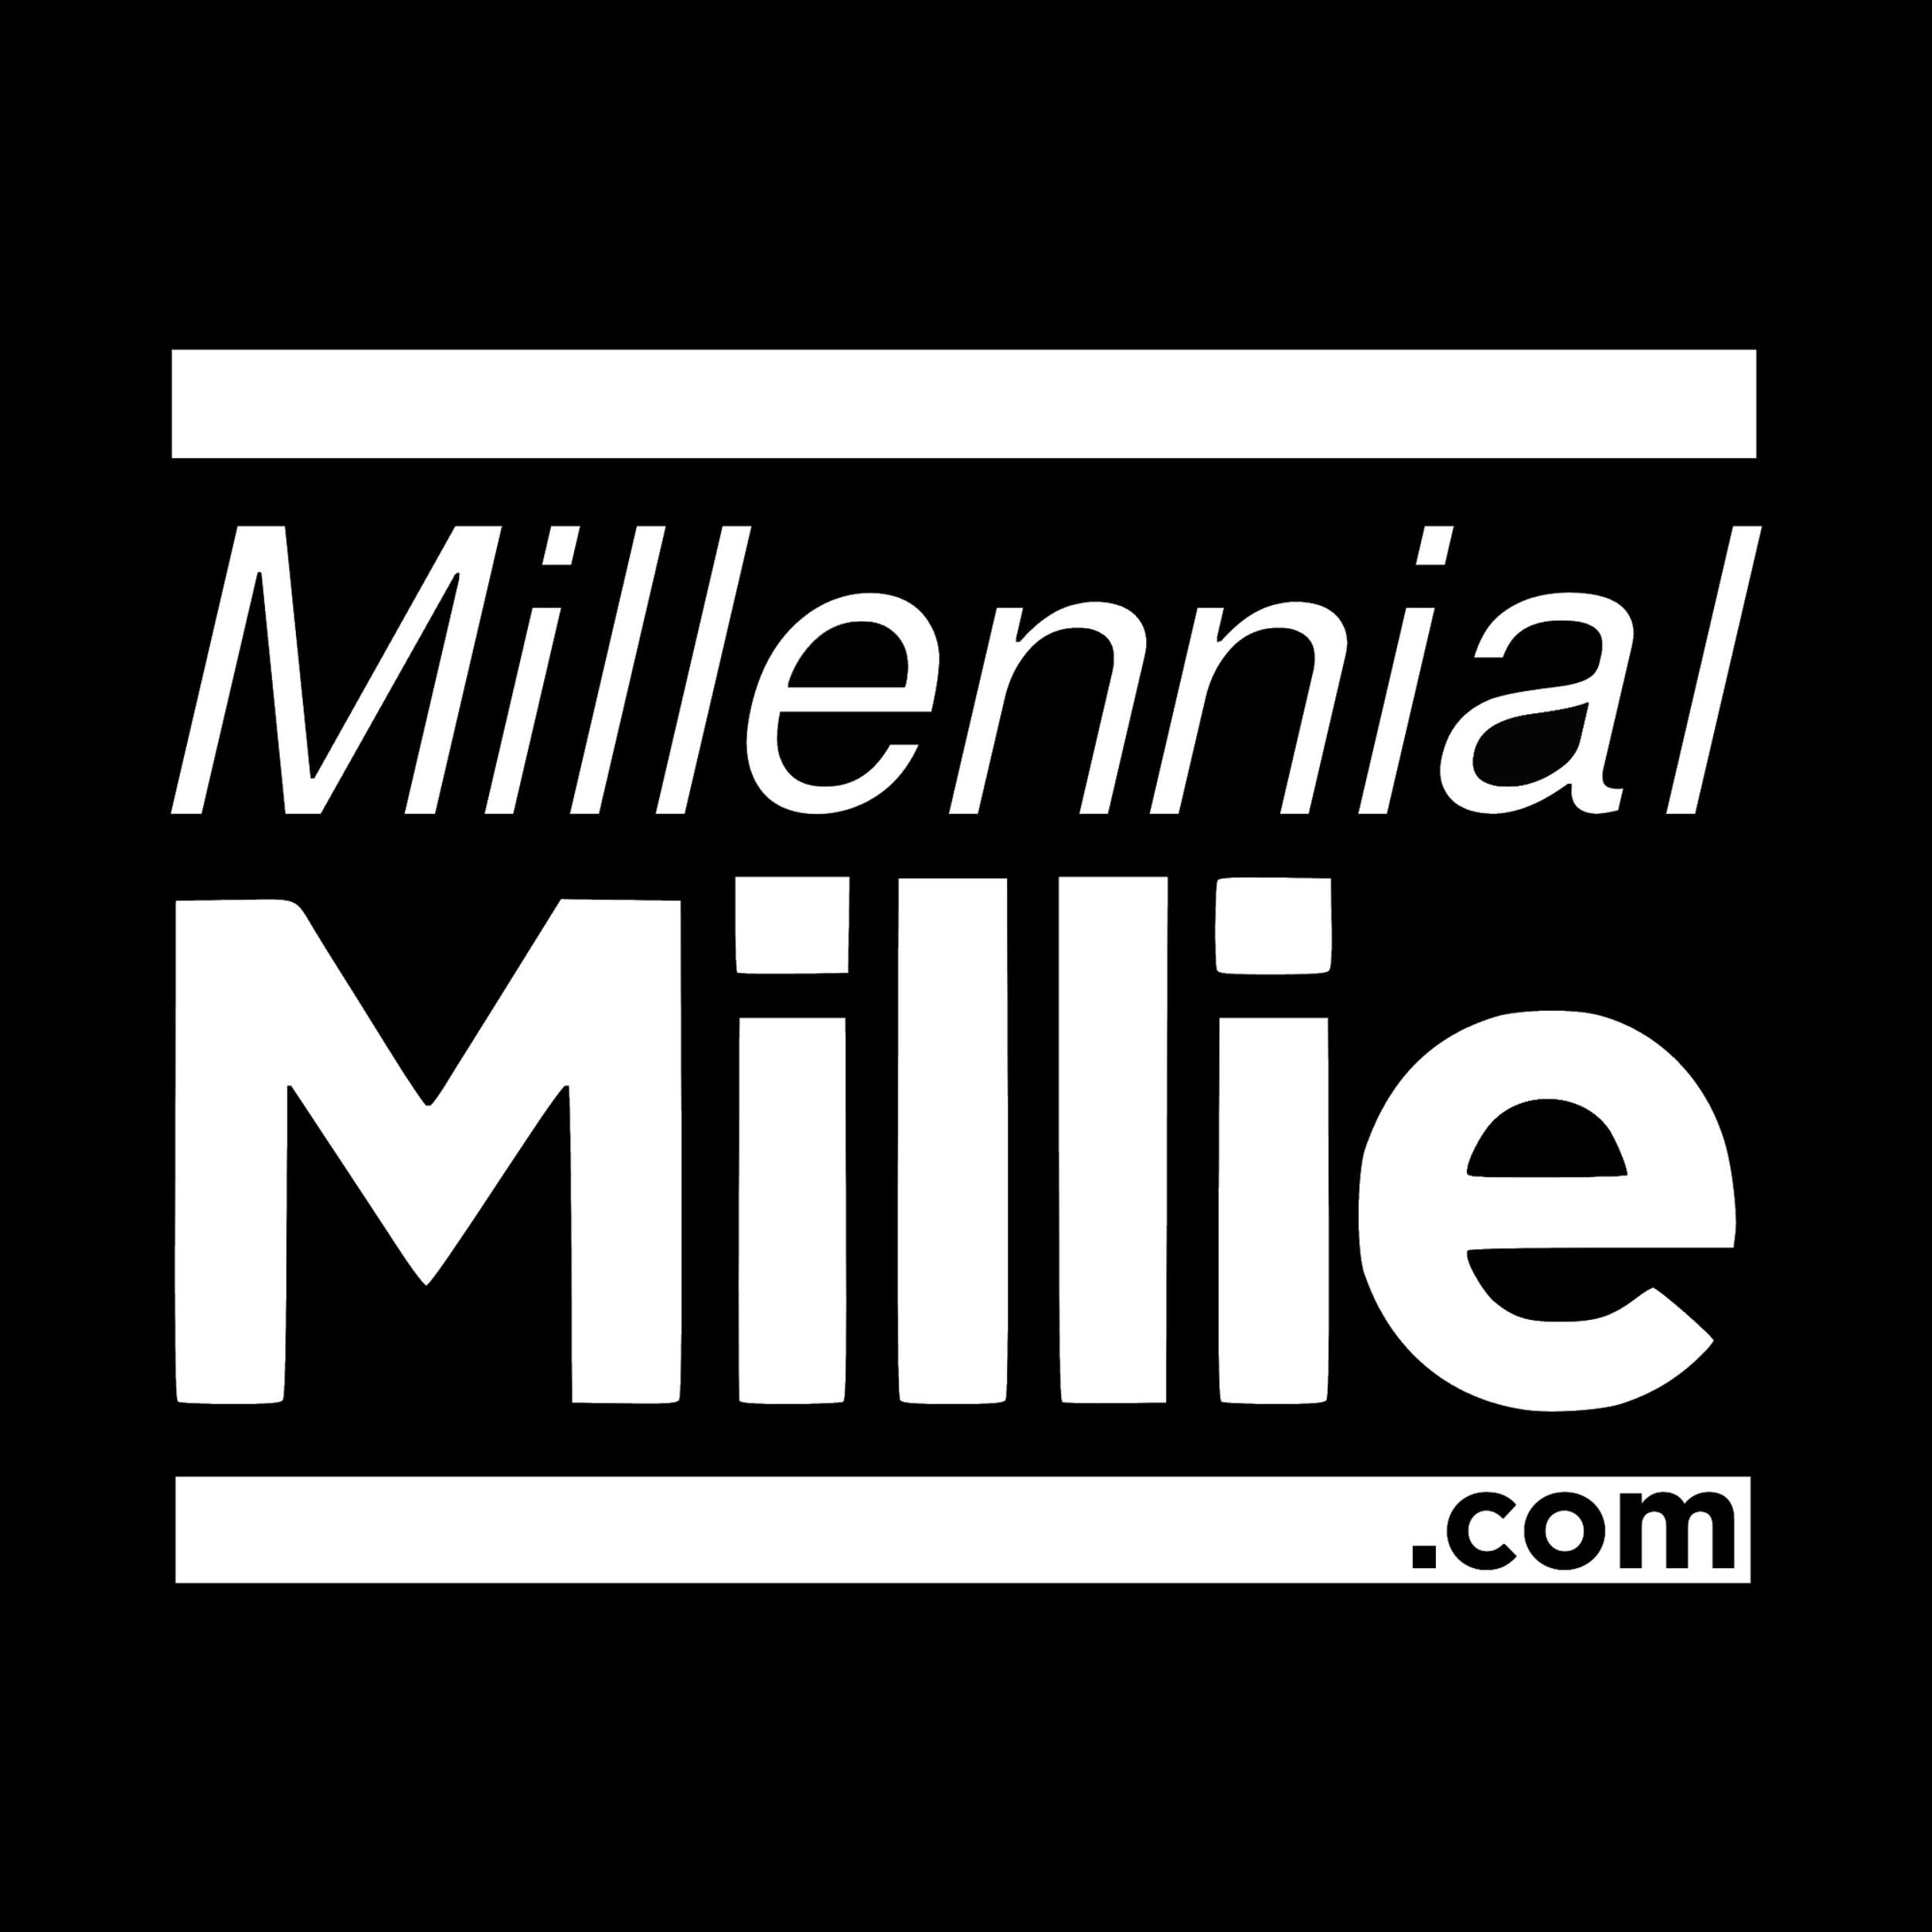 www.millennialmillie.com